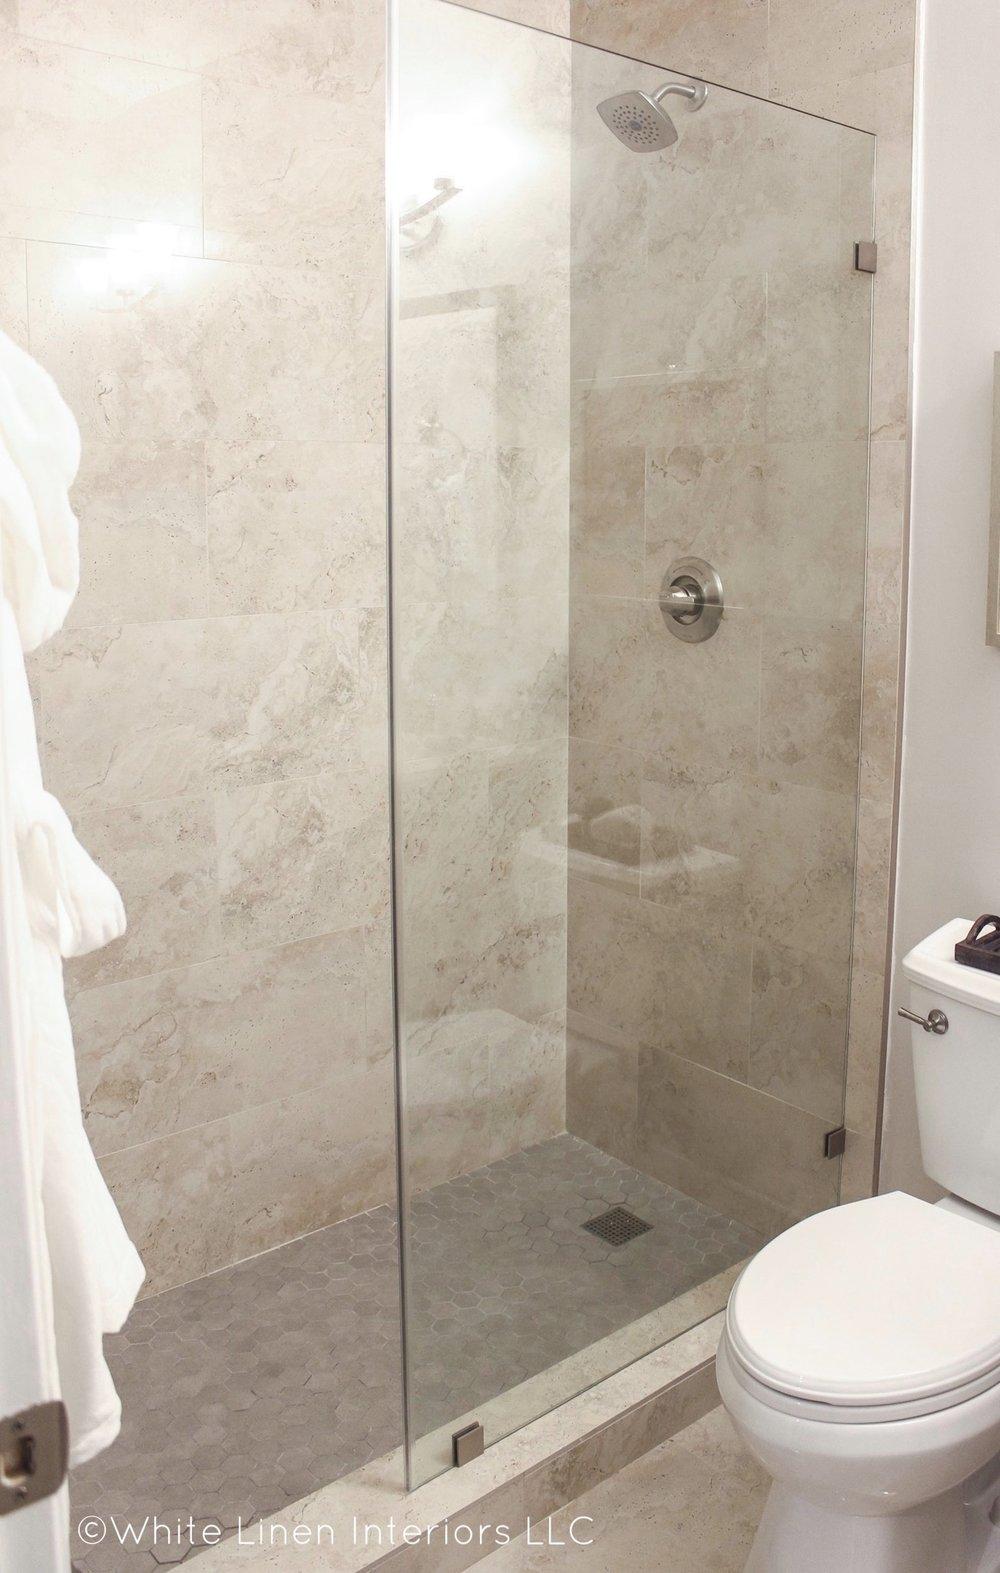 Miami Bathroom Remodel Project